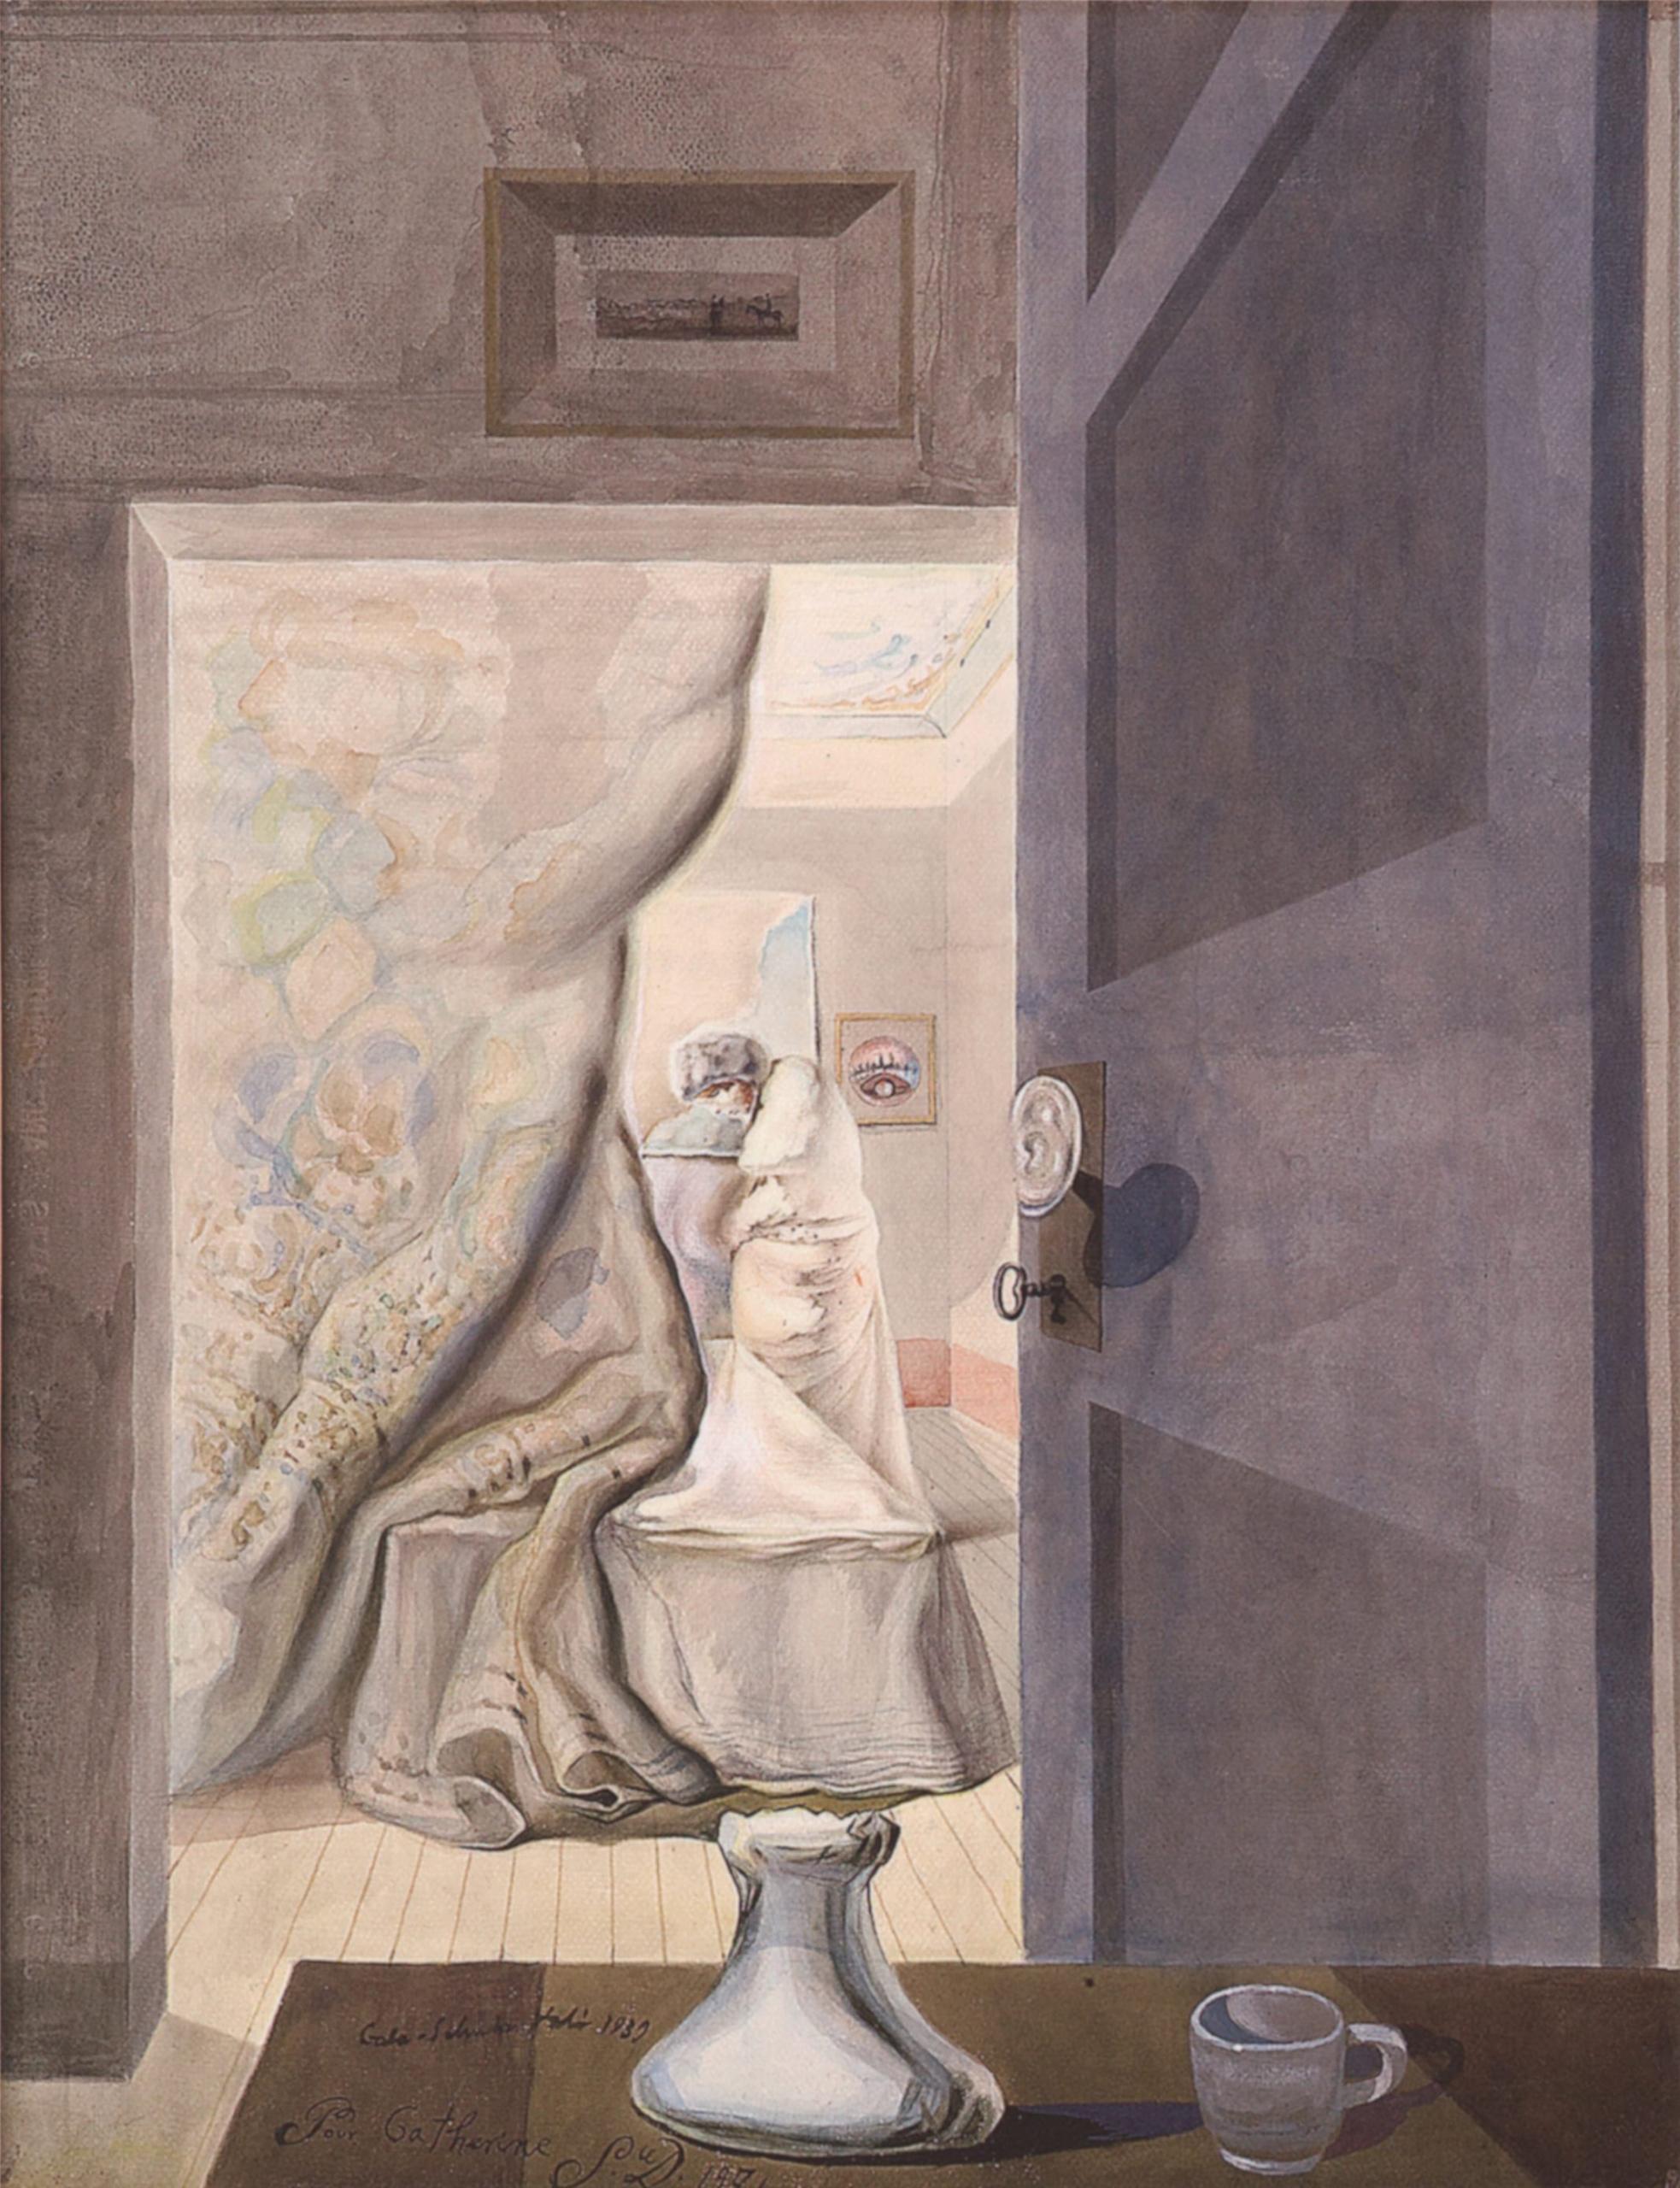 Salvador Dali at Musée d'art moderne, Céret